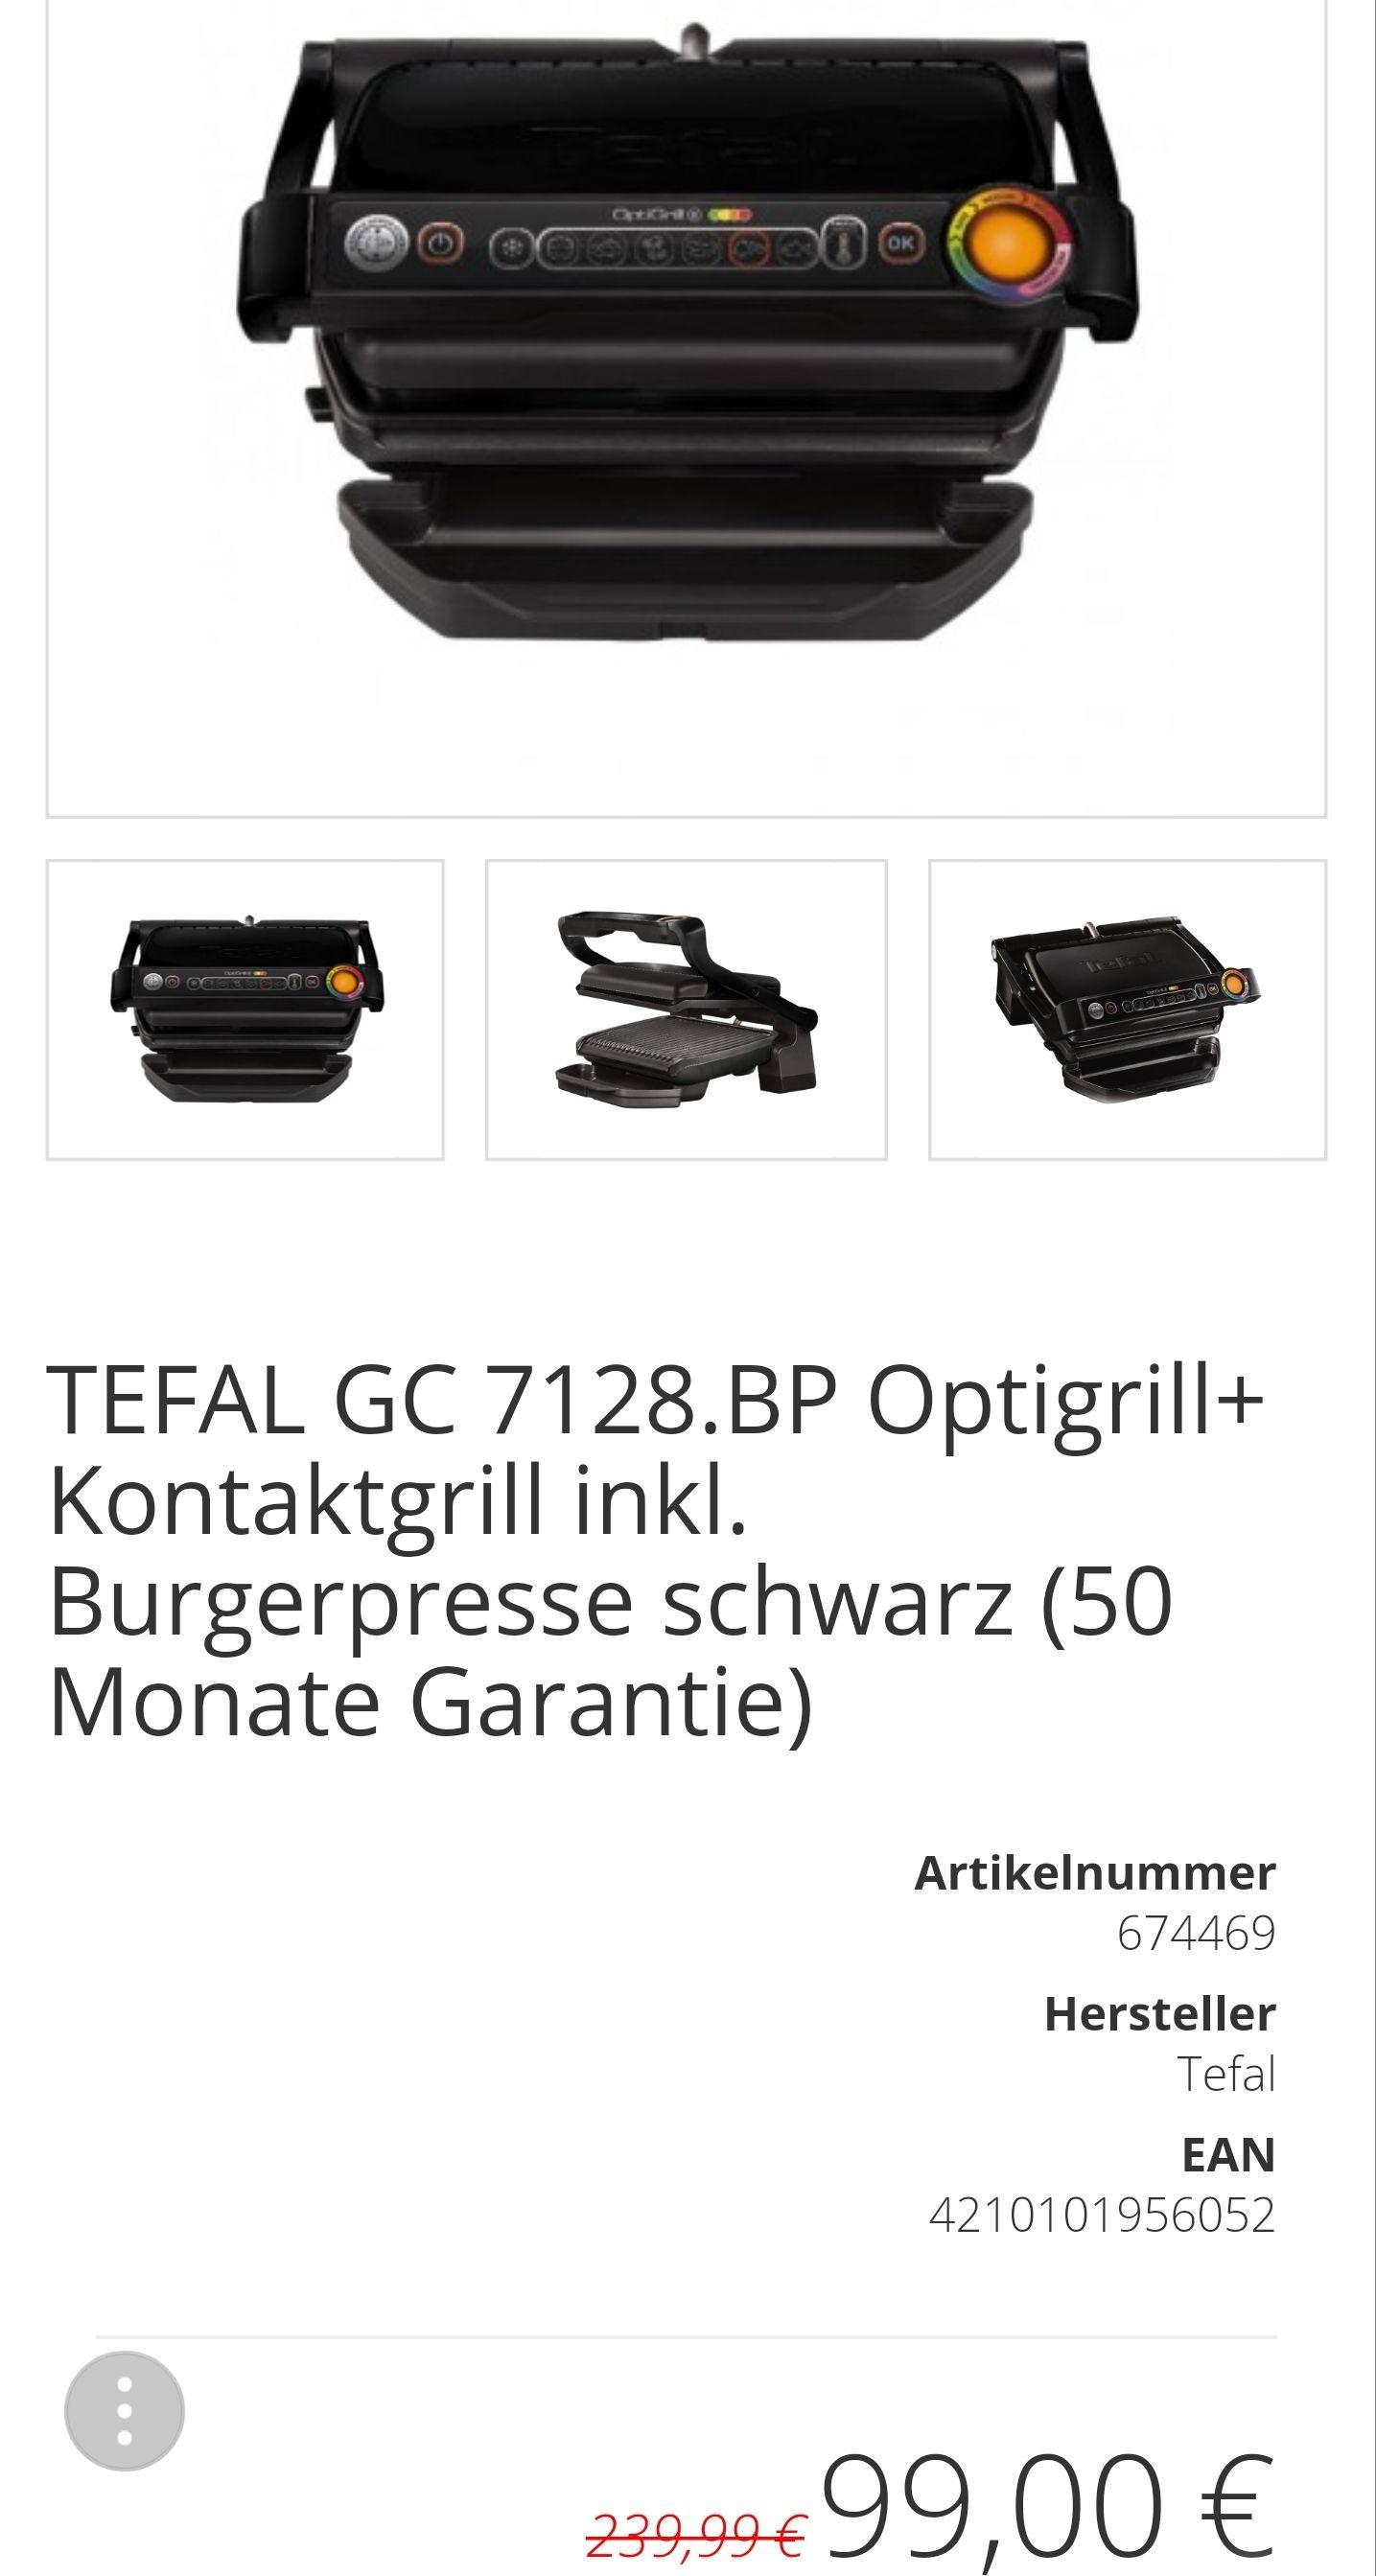 TEFAL GC 7128.BP Optigrill+ Kontaktgrill inkl. Burgerpresse schwarz (50 Monate Garantie)